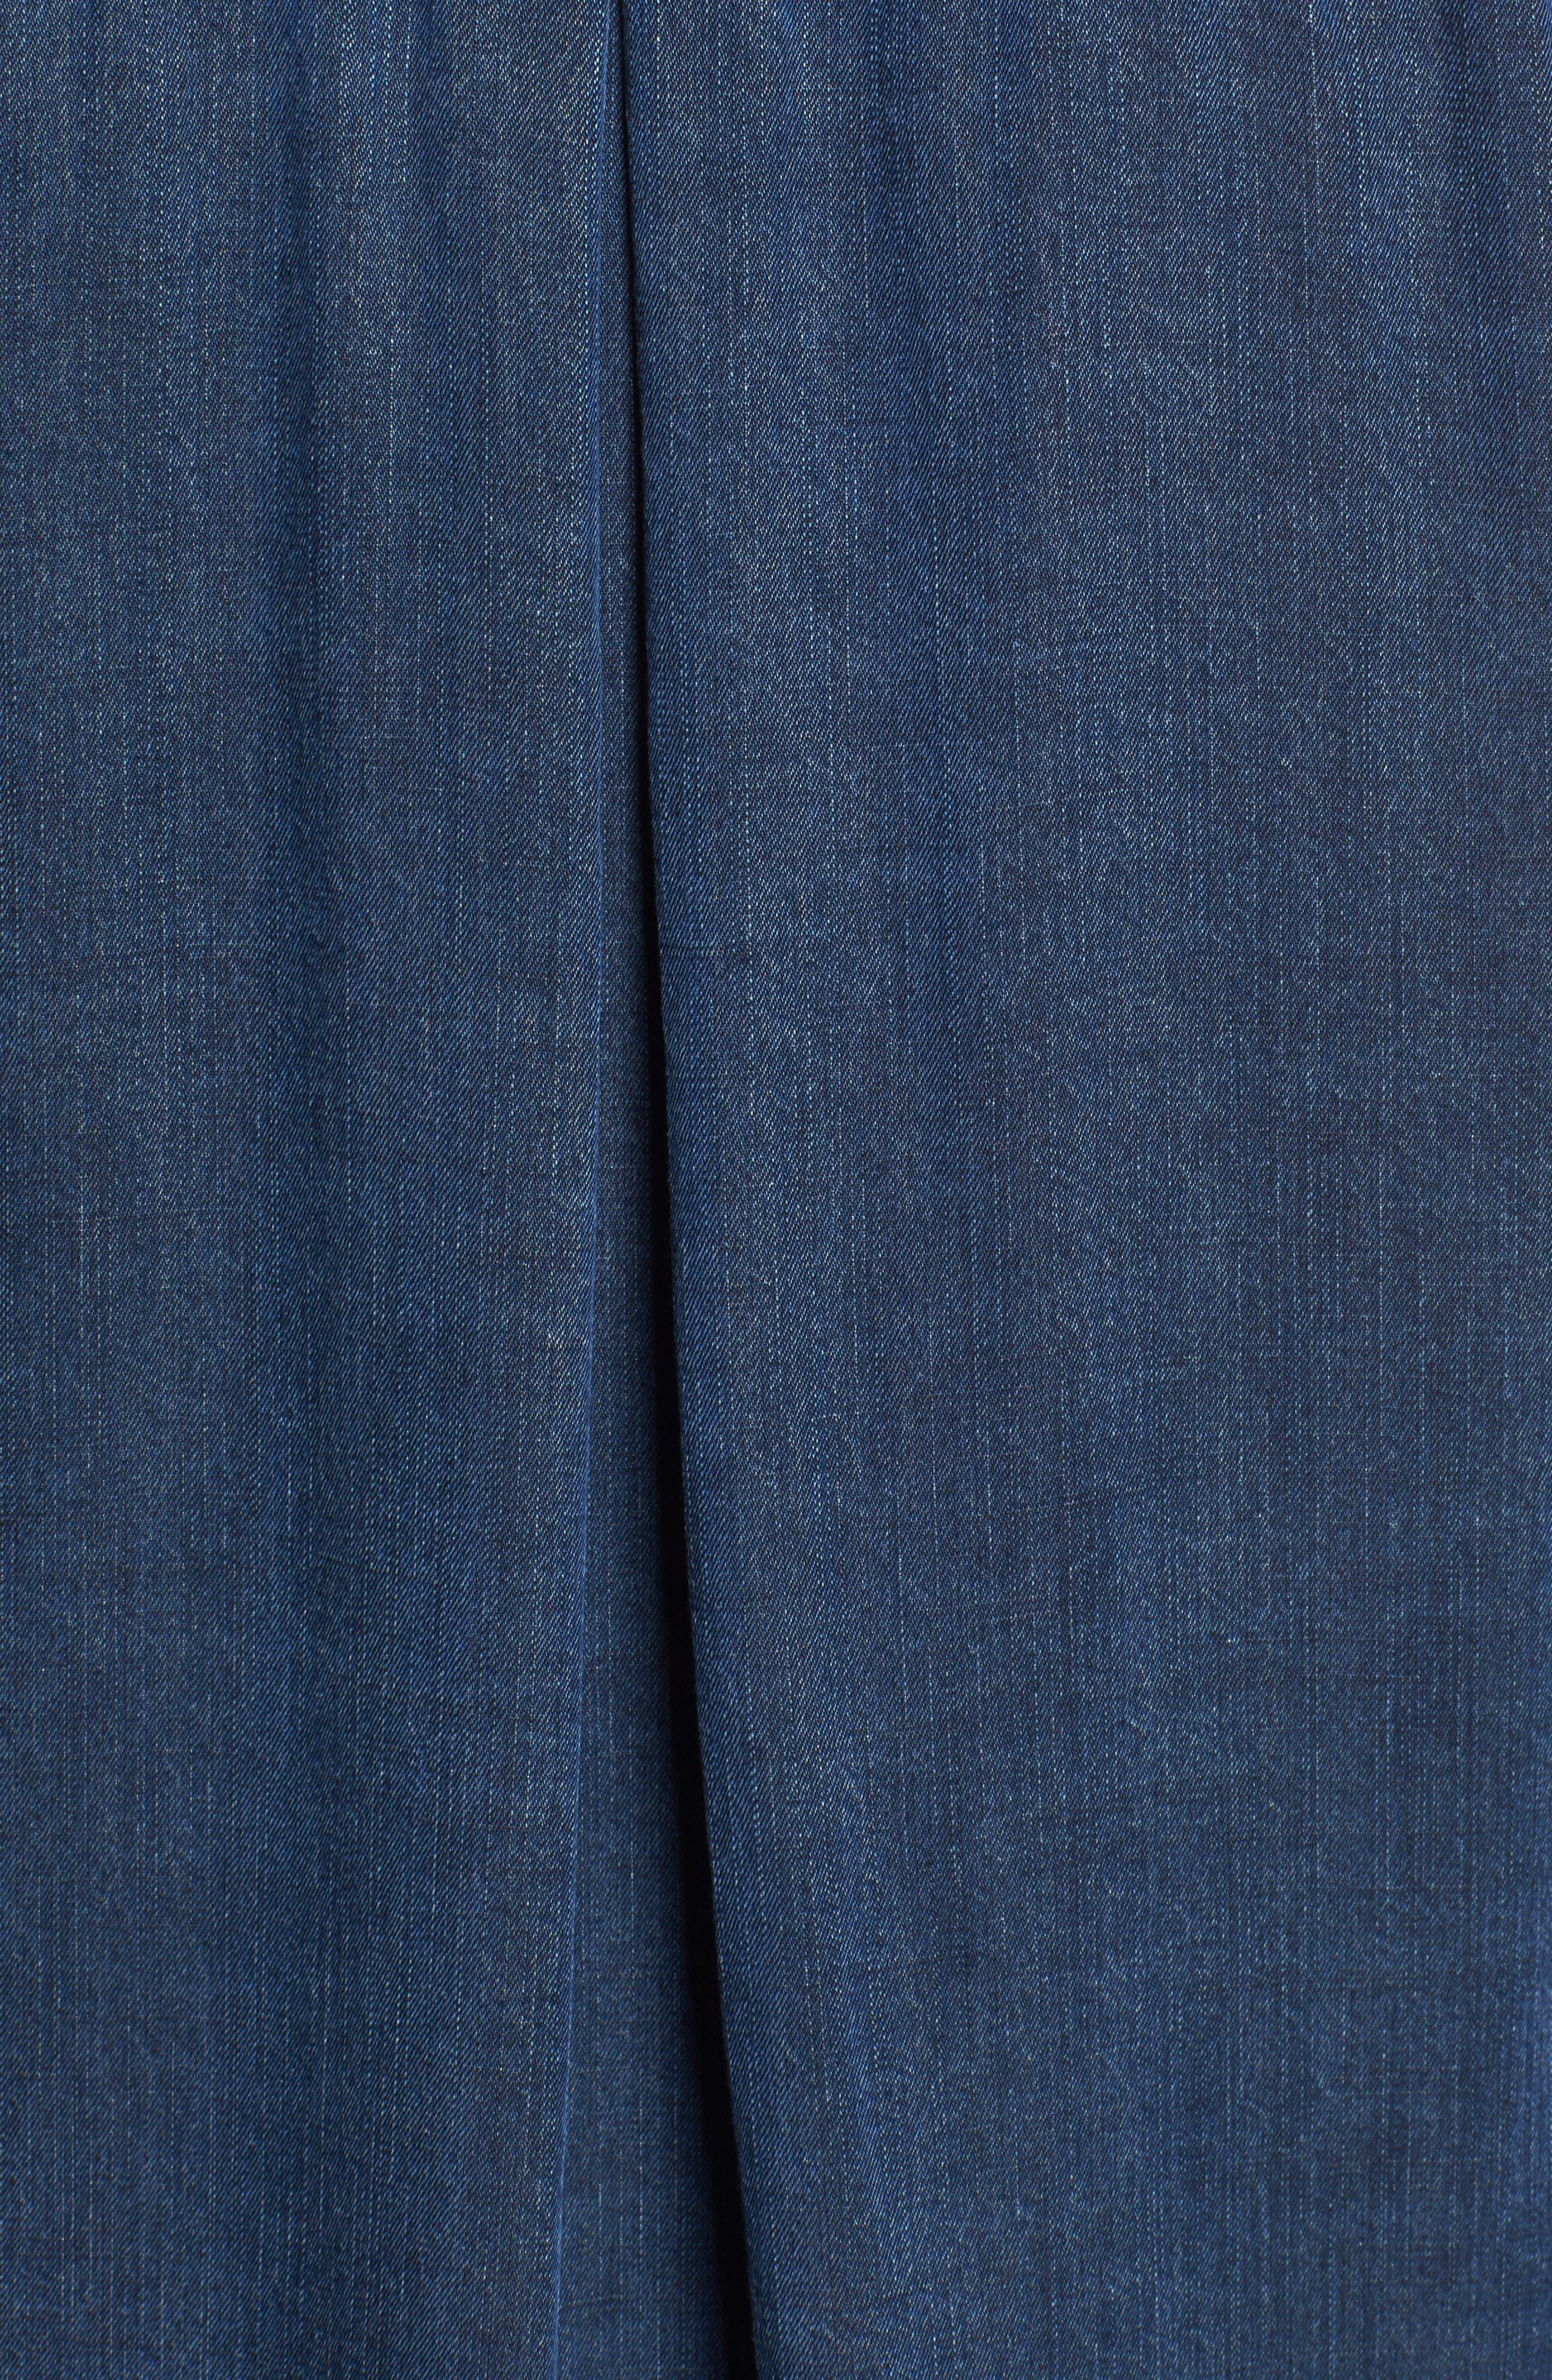 Bethany Tie Cuff Denim Shirt,                             Alternate thumbnail 5, color,                             Dark Vintage Wash